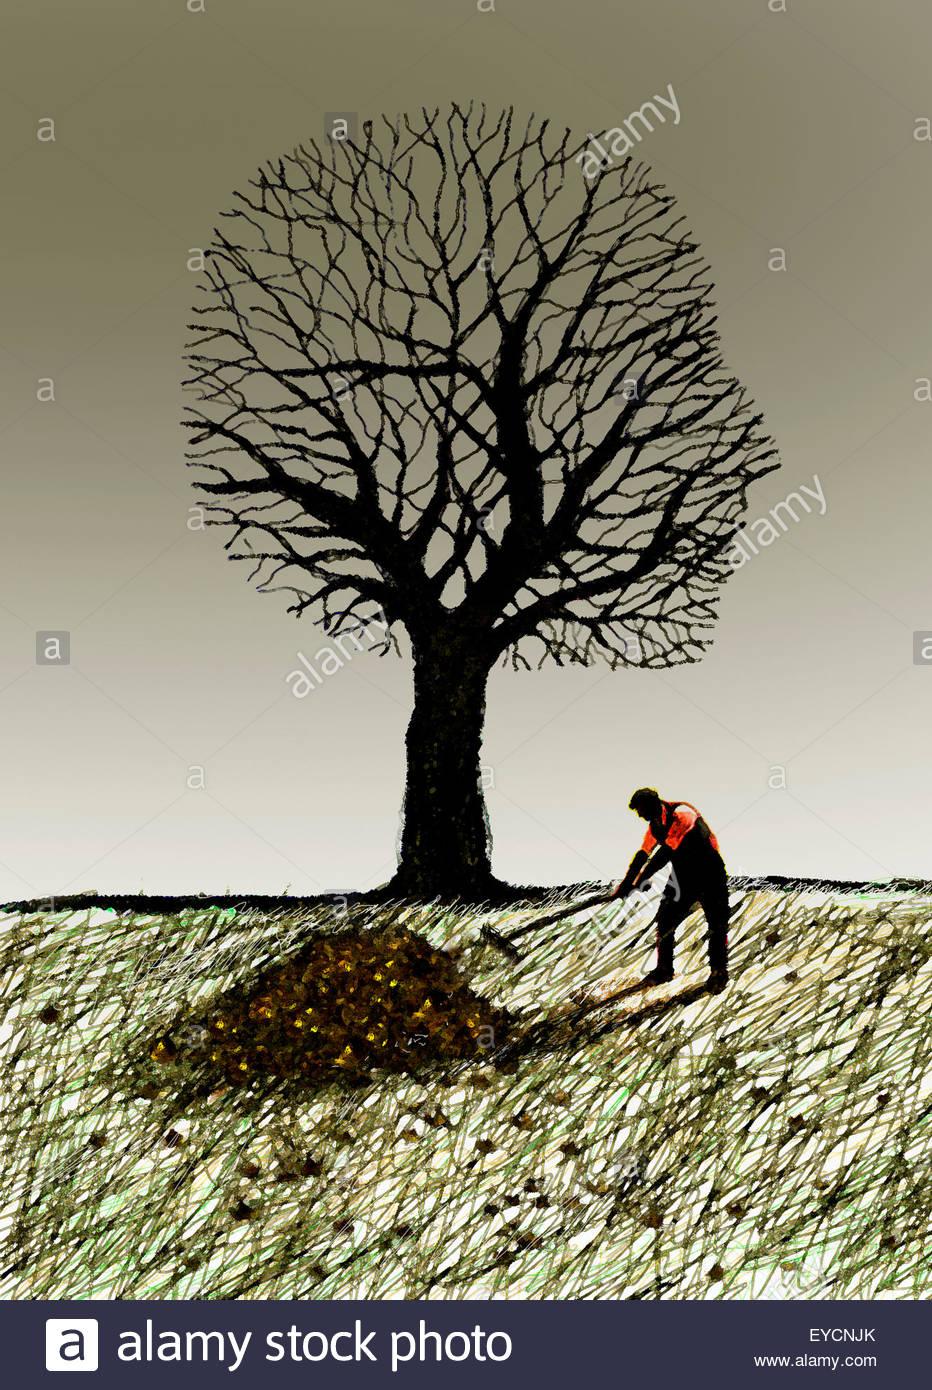 Man raking autumn leaves under anthropomorphic tree - Stock Image